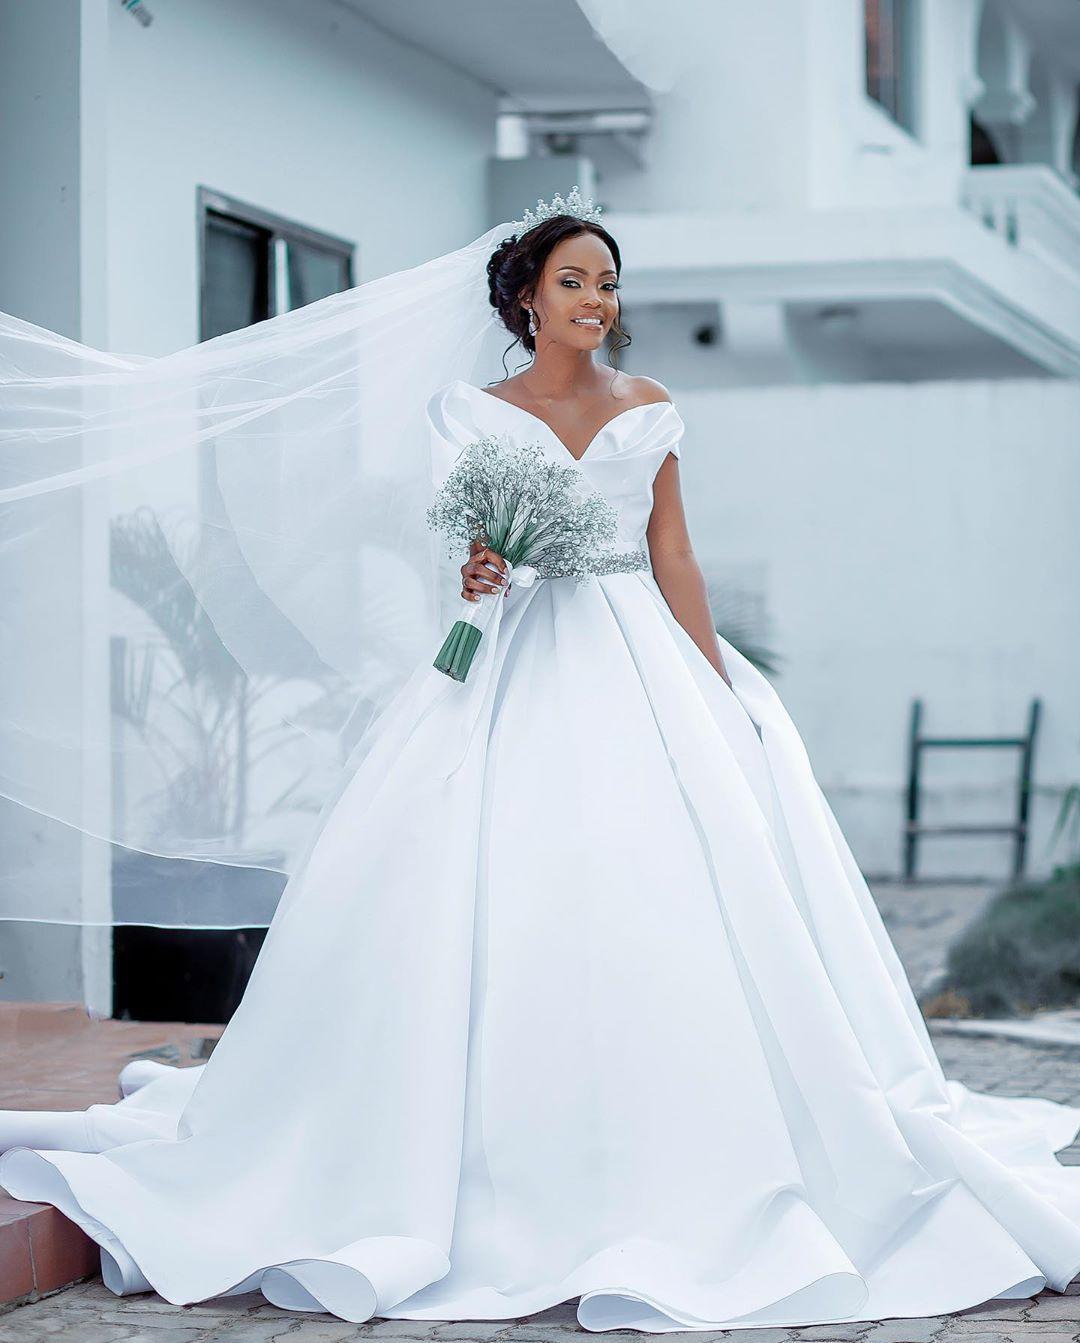 The Best Dressed Black Brides This Wedding Season In 2020 Black Wedding Dresses Black Bride Beautiful Wedding Dresses